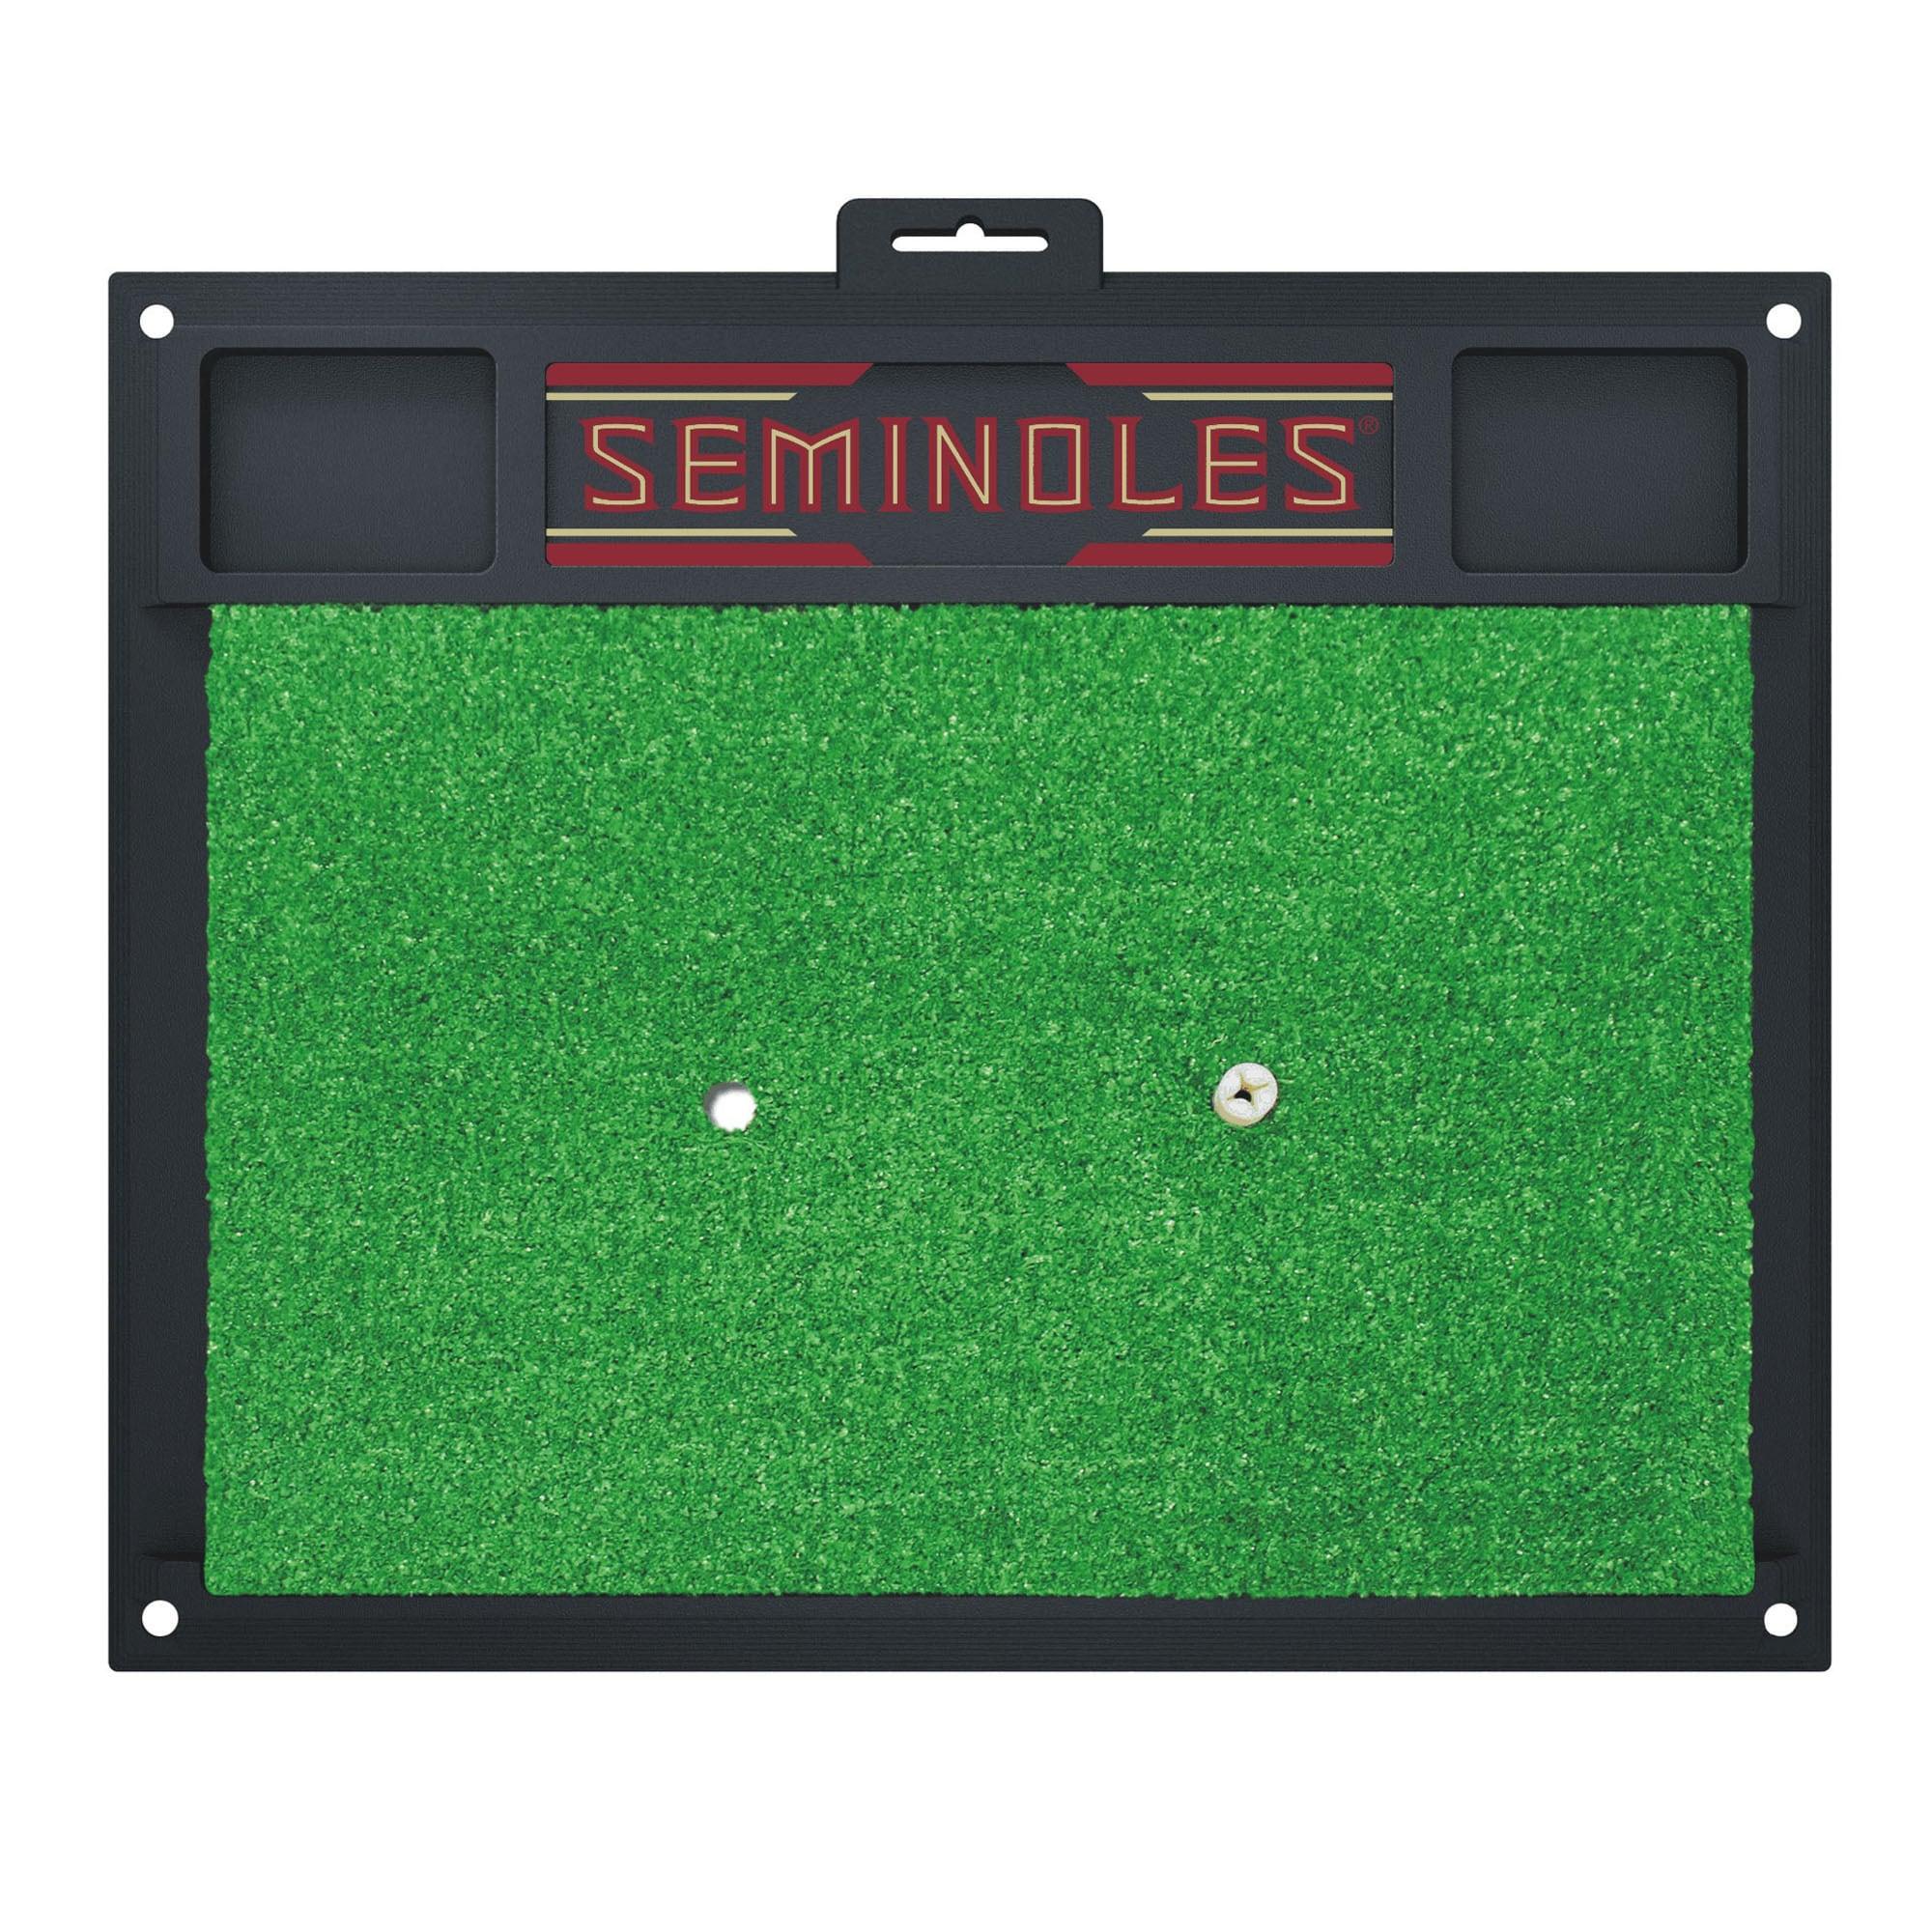 Fan Mats Florida State Seminoles Green Rubber Golf Hittin...